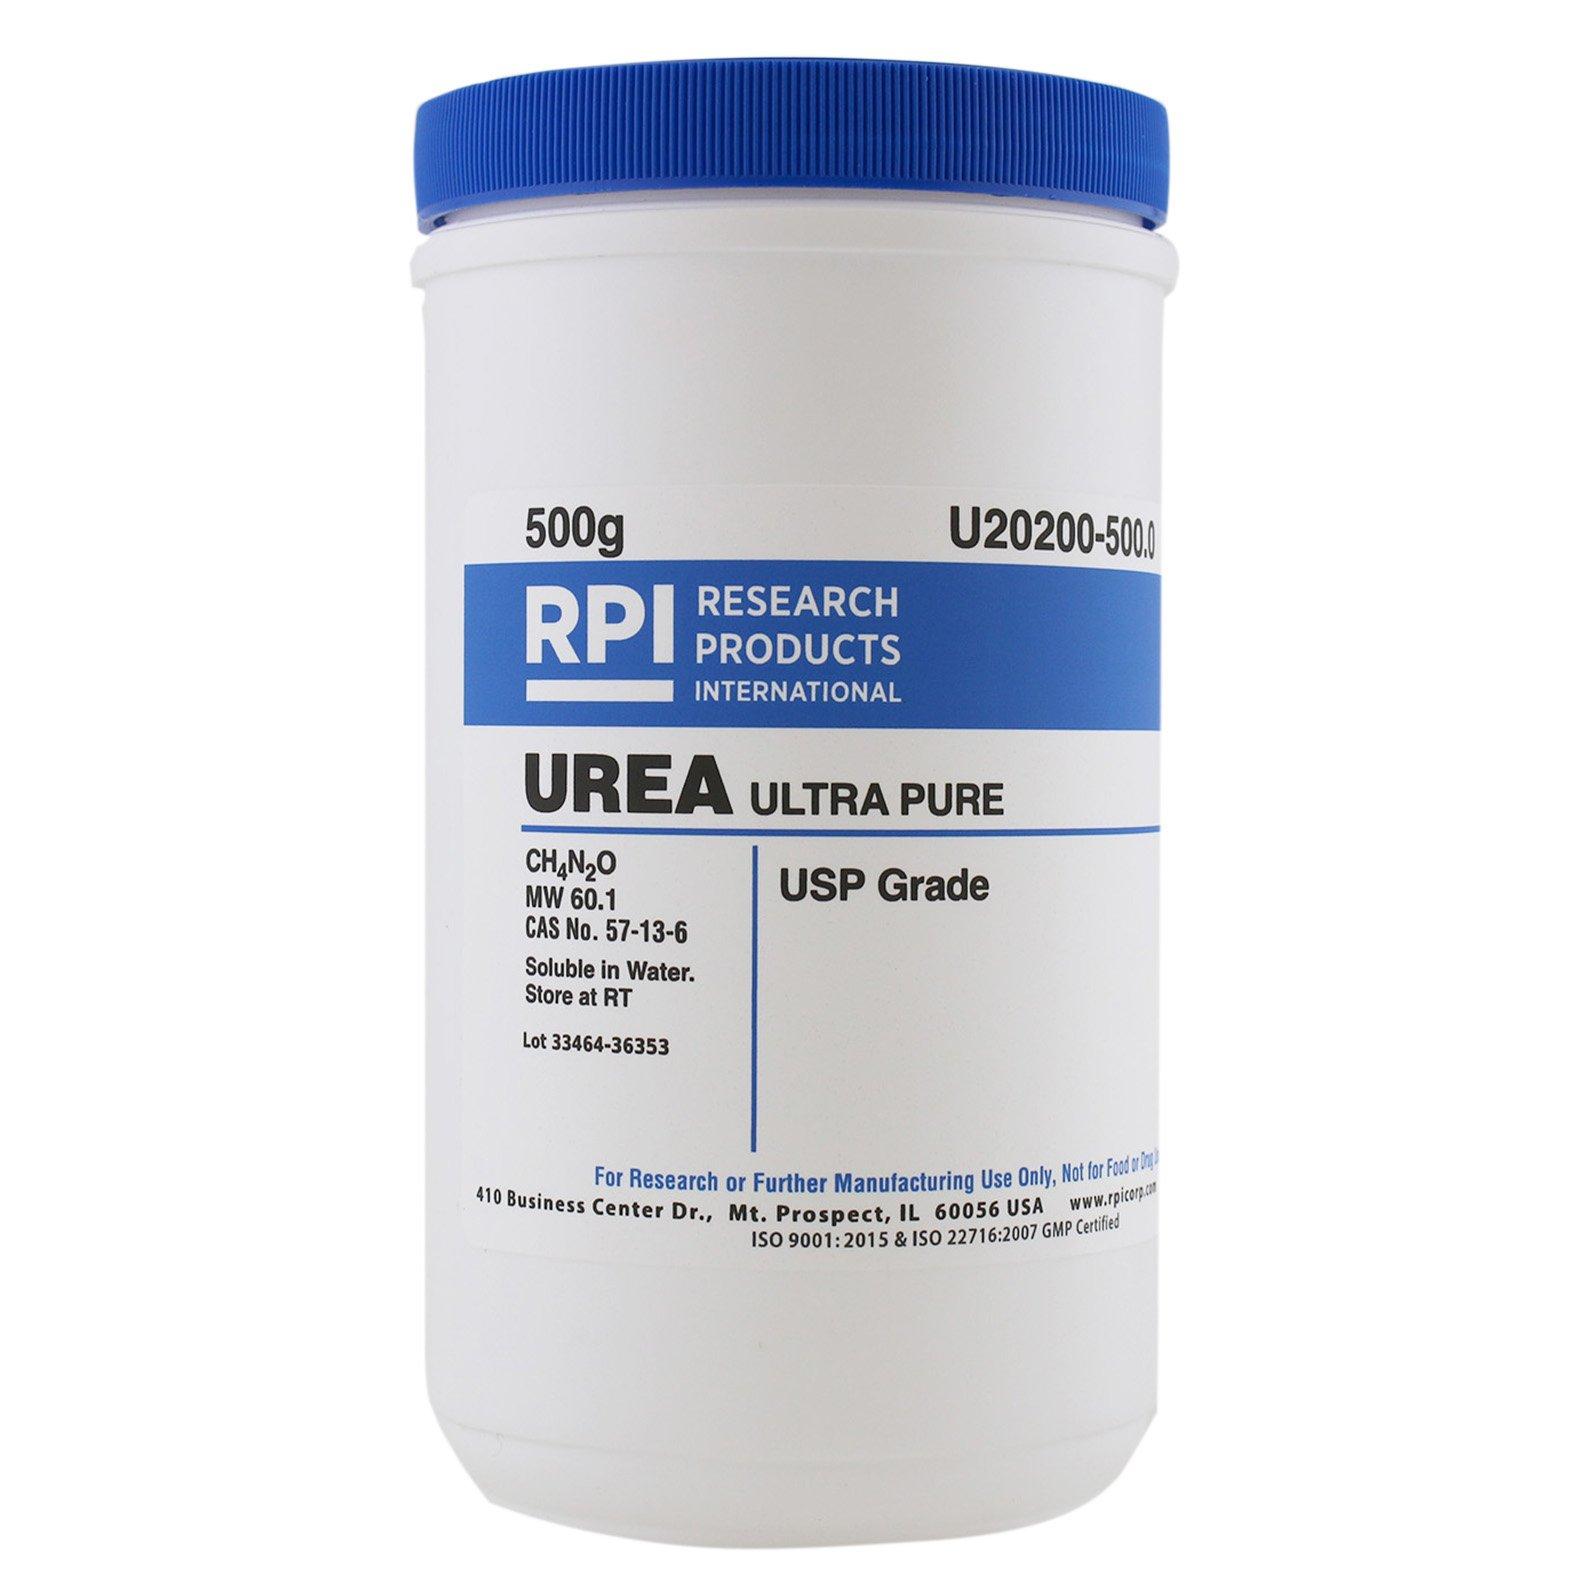 RPI Urea Crystalline Powder, 500 Grams, USP Grade UltraPure, for Cell Culture and Protein Denaturing